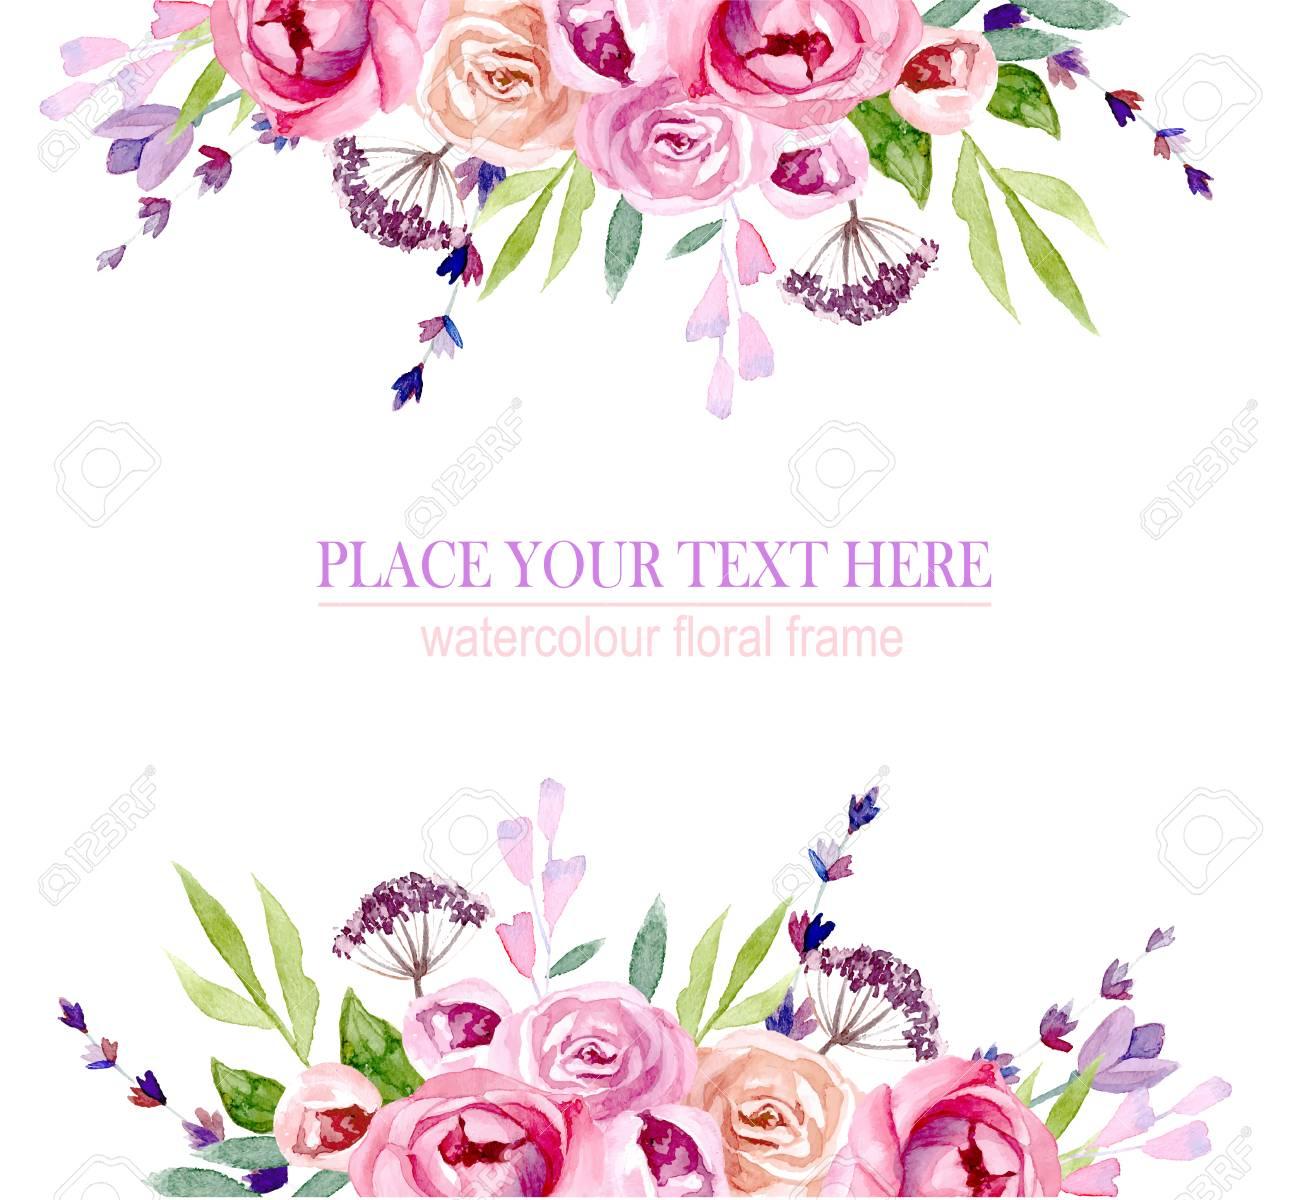 wreath of flowers in watercolor - 100788335